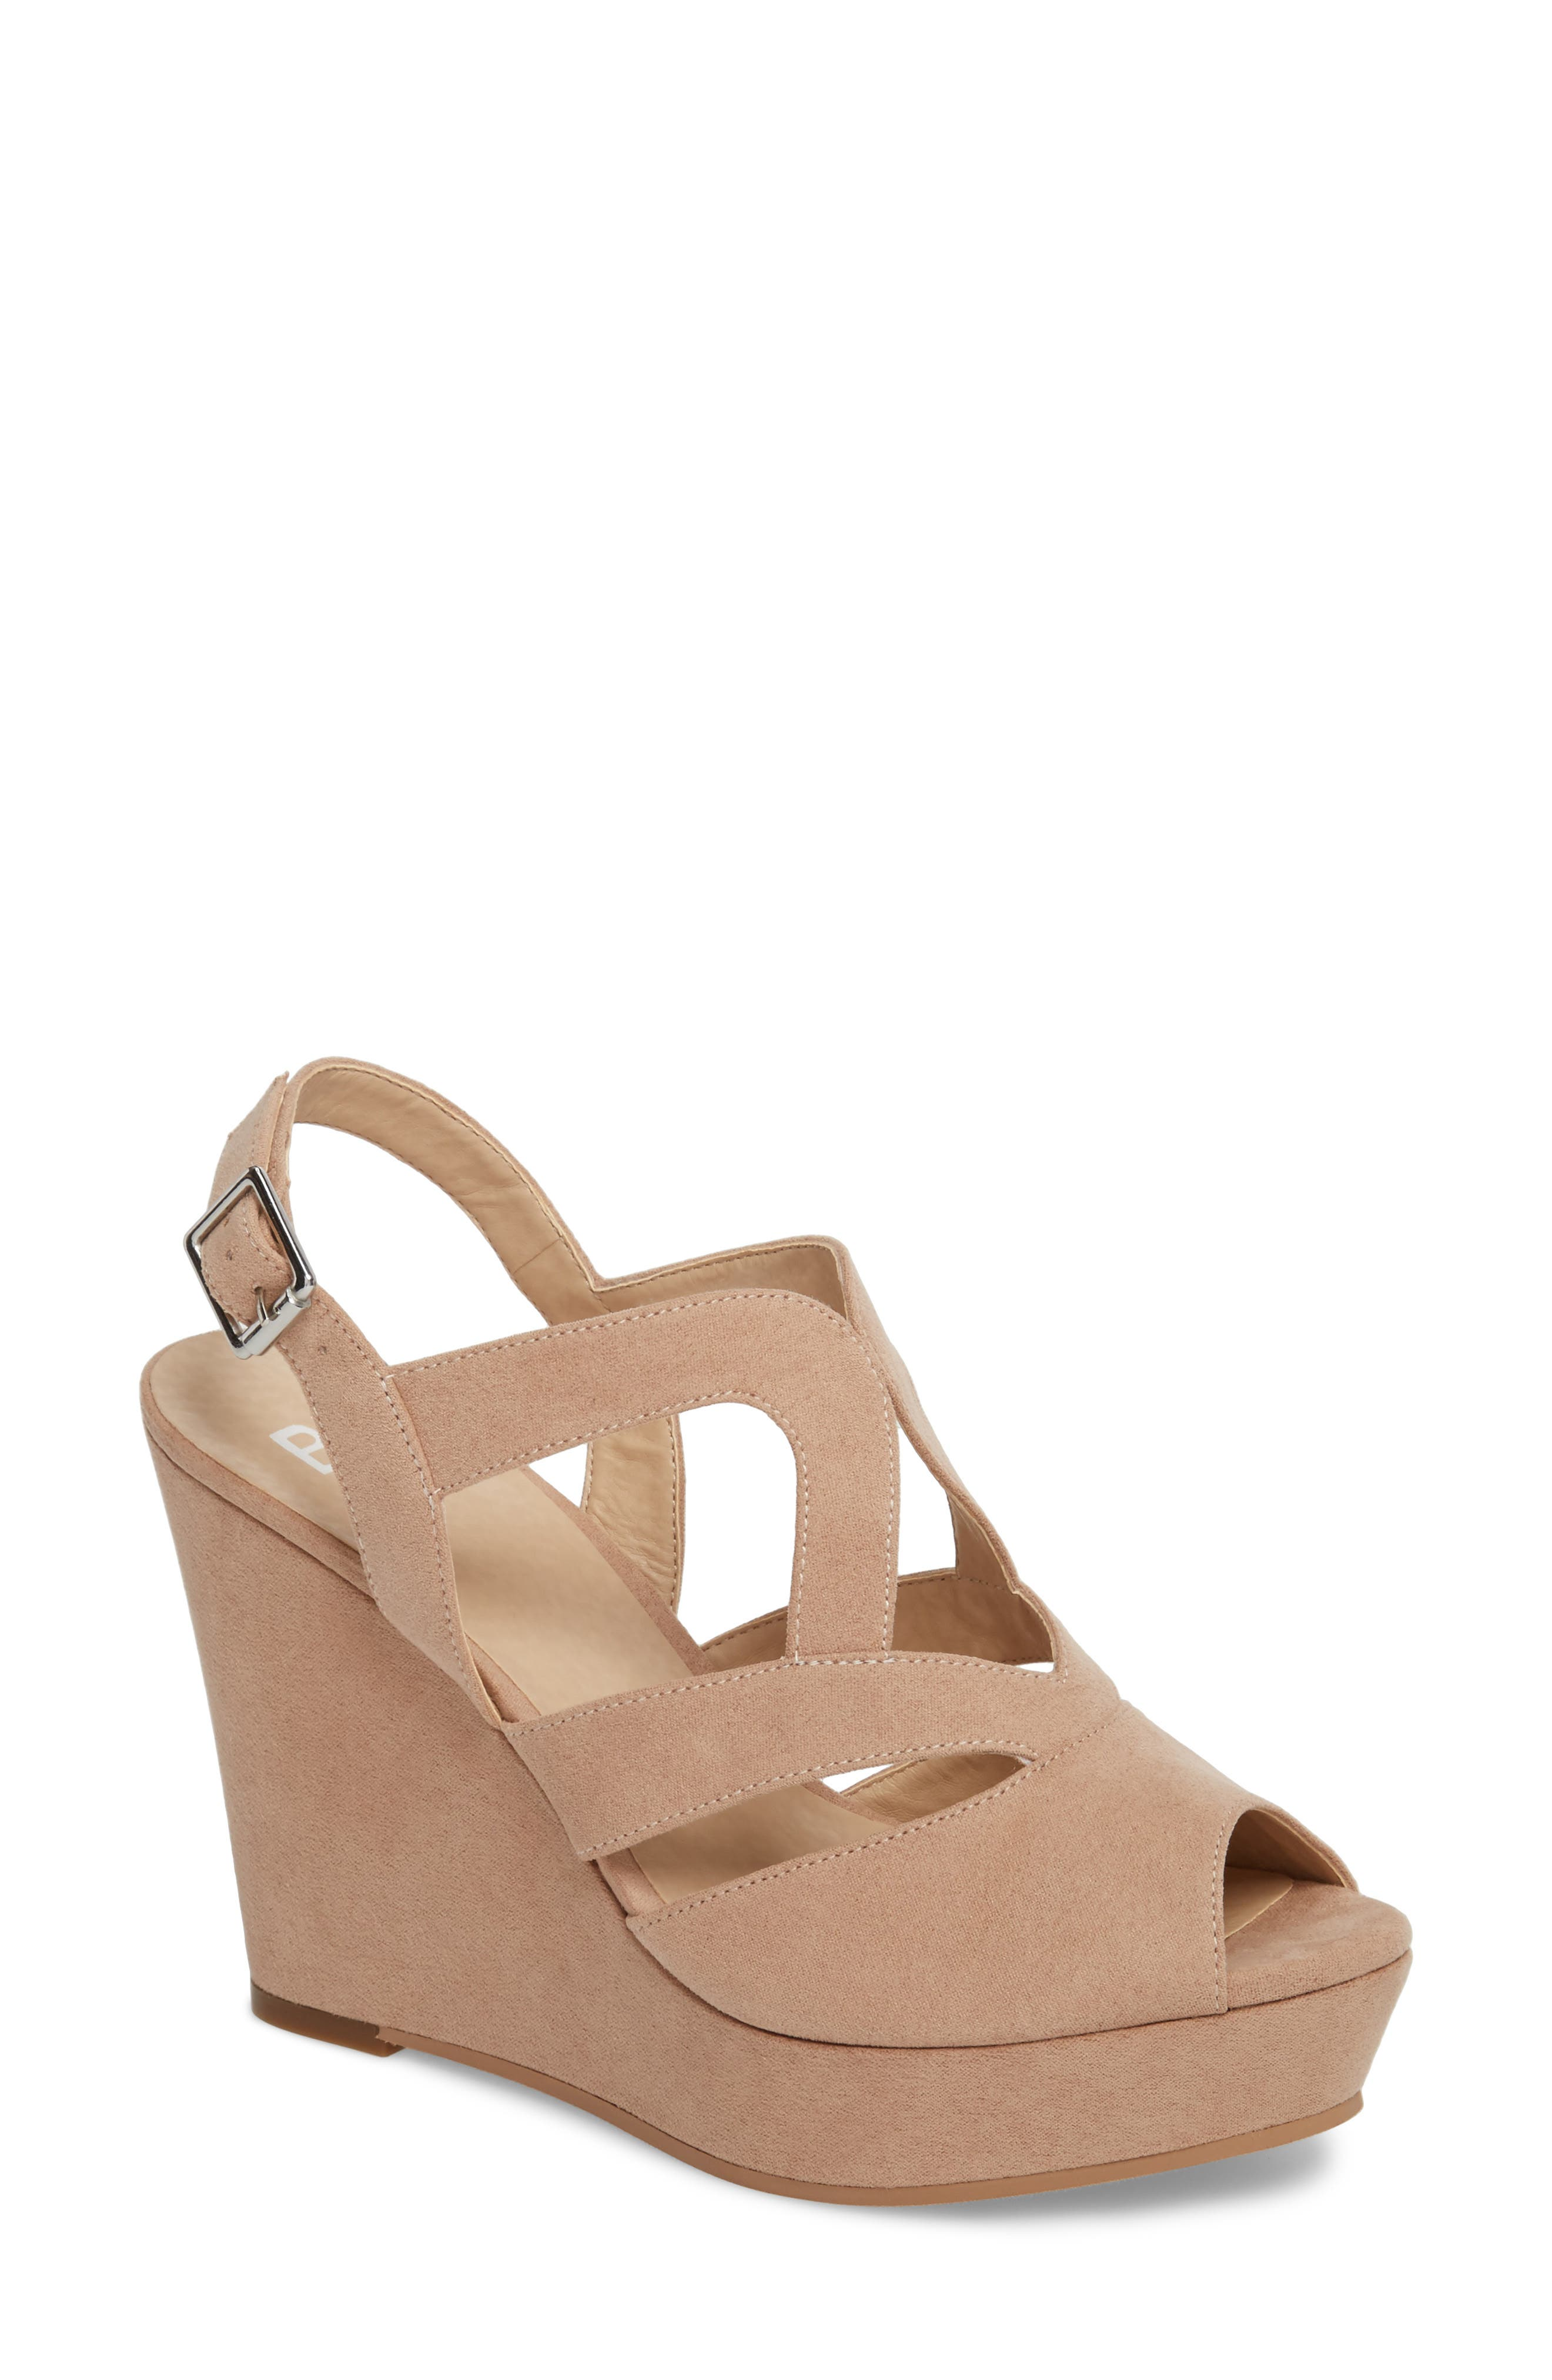 Sunny Platform Wedge Sandal,                         Main,                         color, Nude Faux Suede